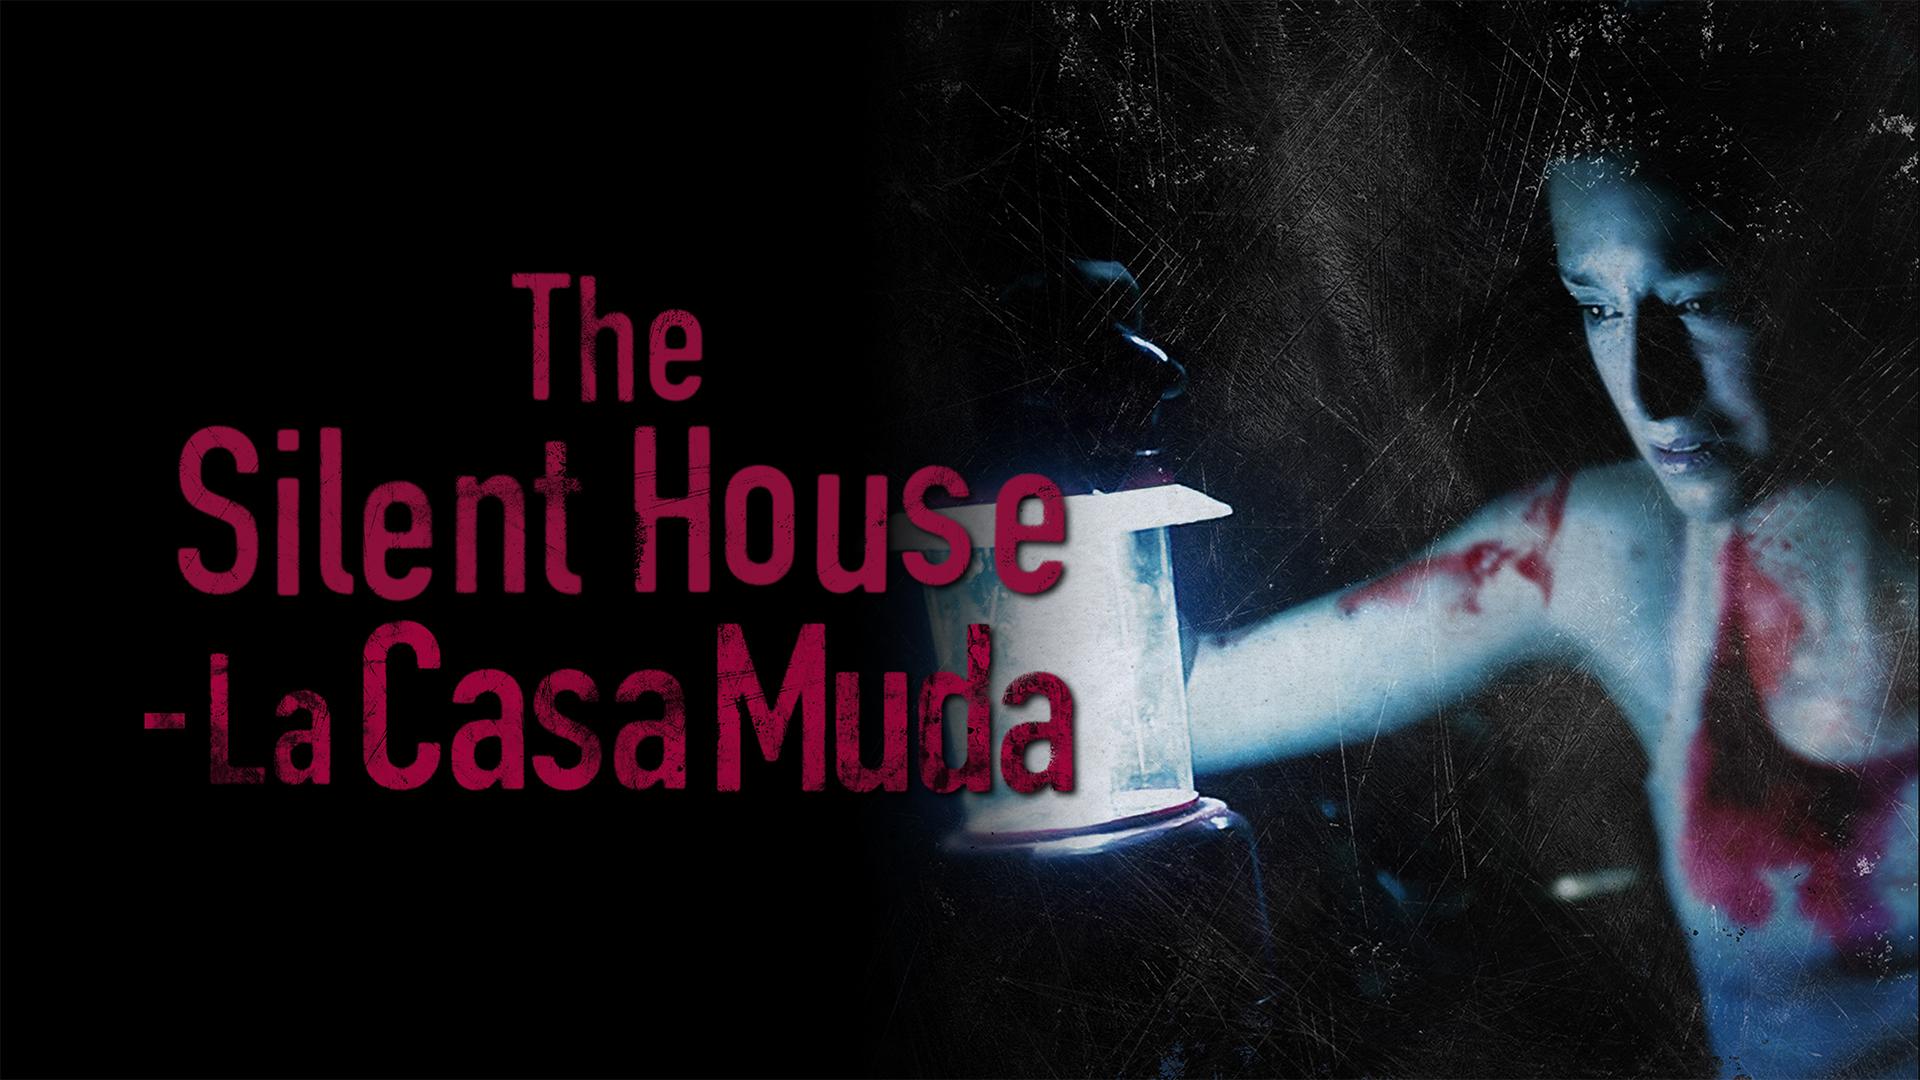 The Silent House (La Casa Muda) (English Subtitled)